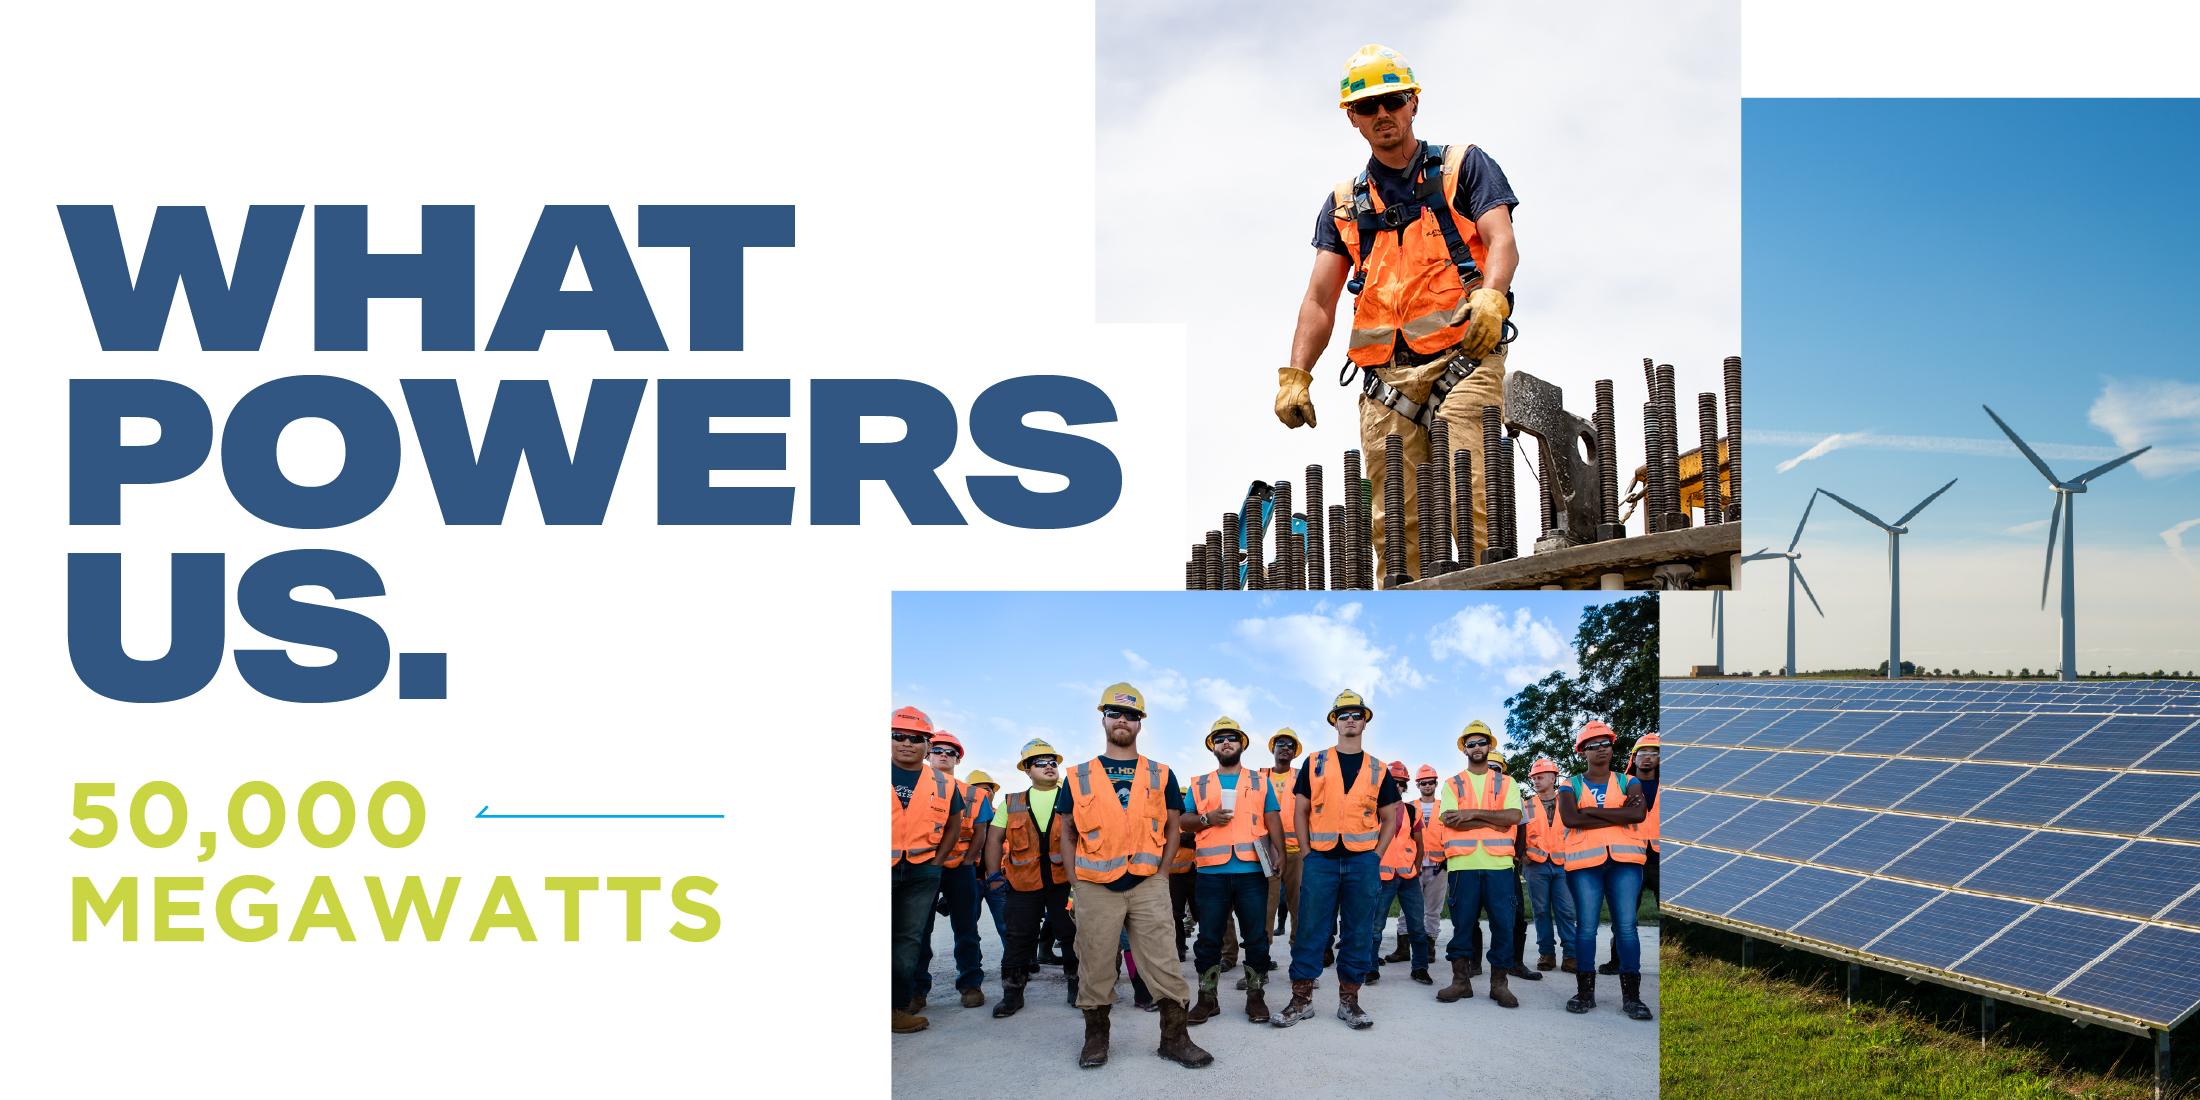 Blattner Reaches 50,000 Renewable Energy Megawatts Industry Milestone